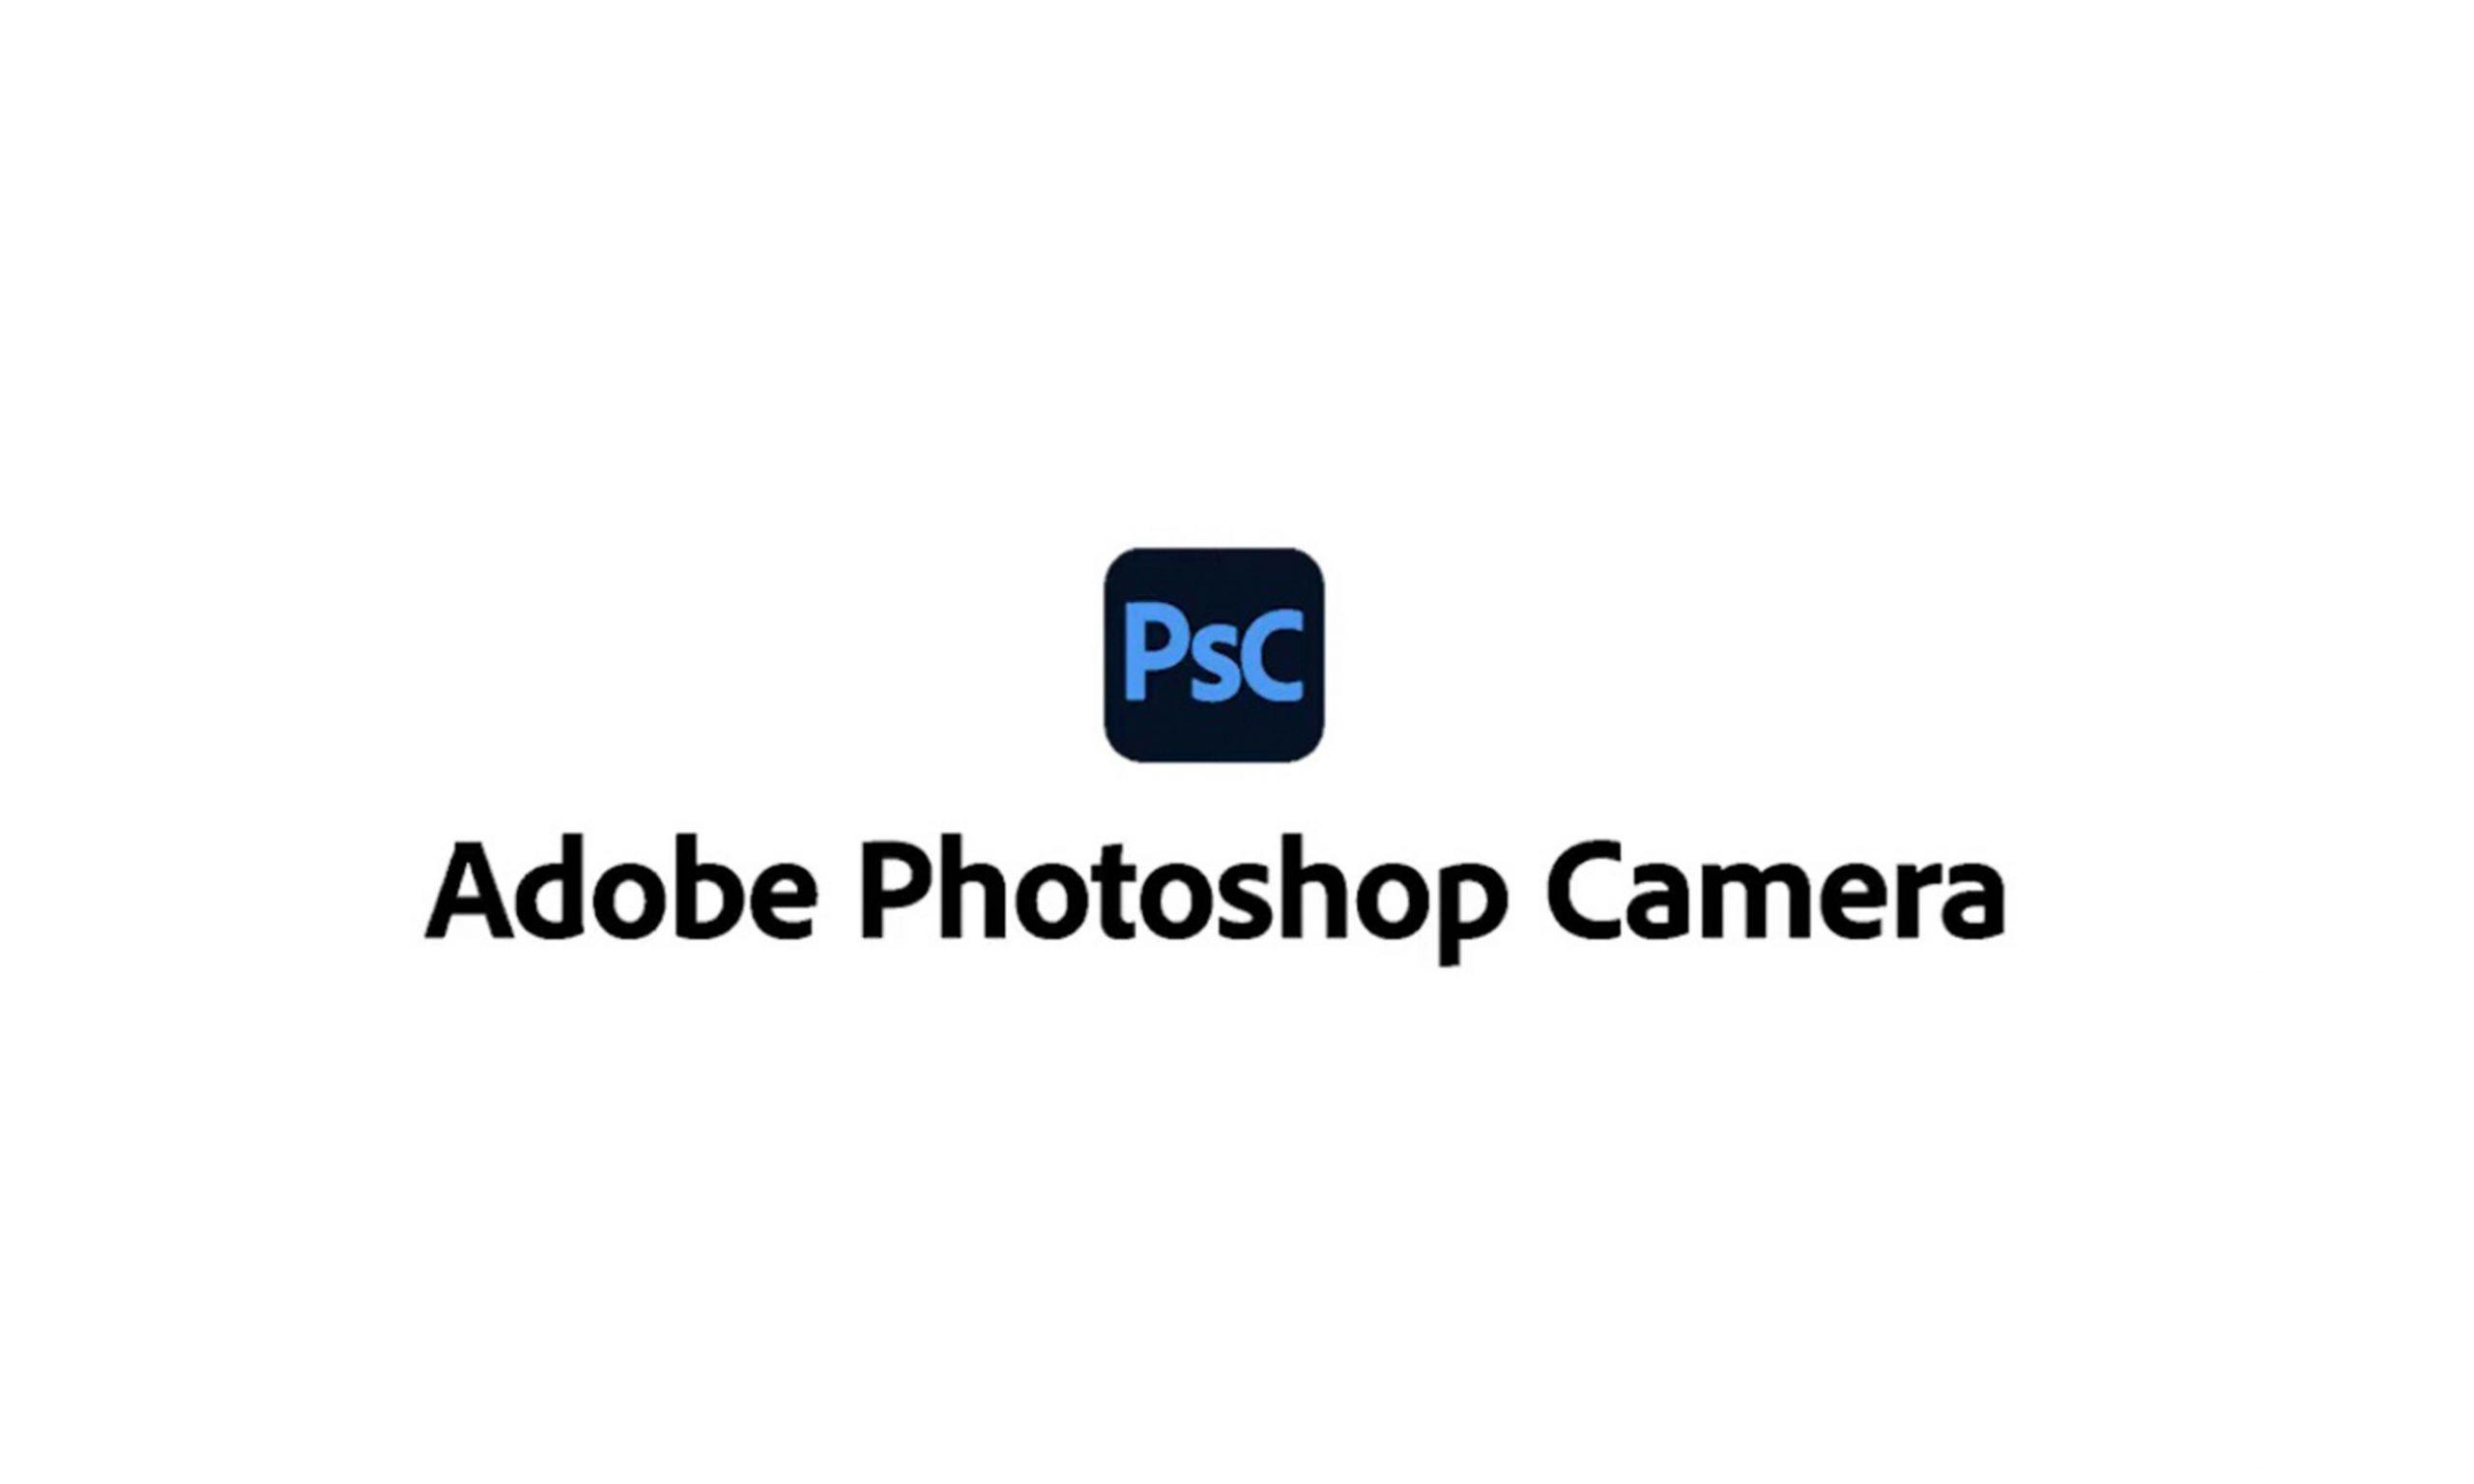 Adobe 为 iOS 和 Android 平台推出 Photoshop Camera 应用程序